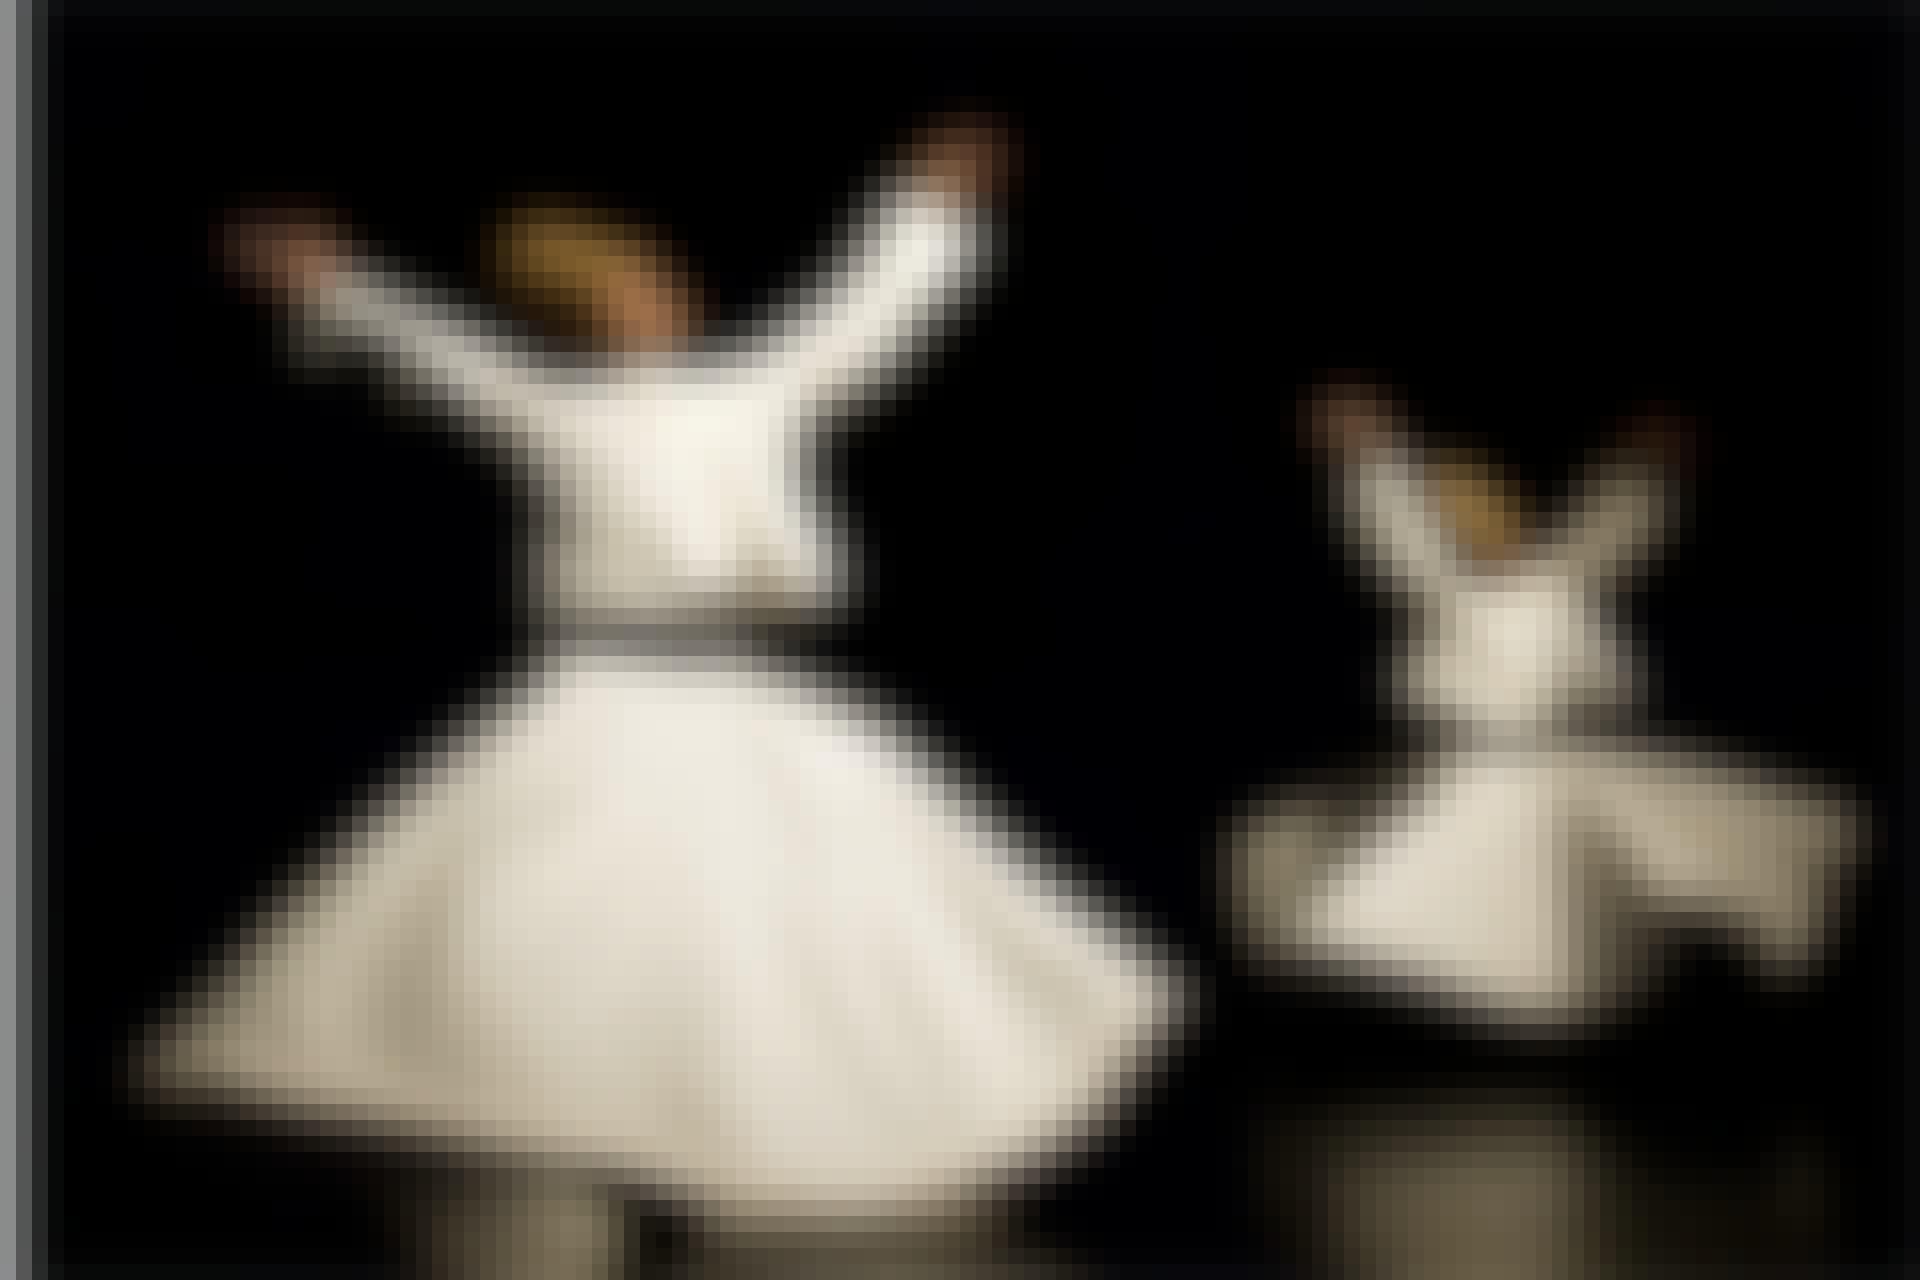 Dancing dervish